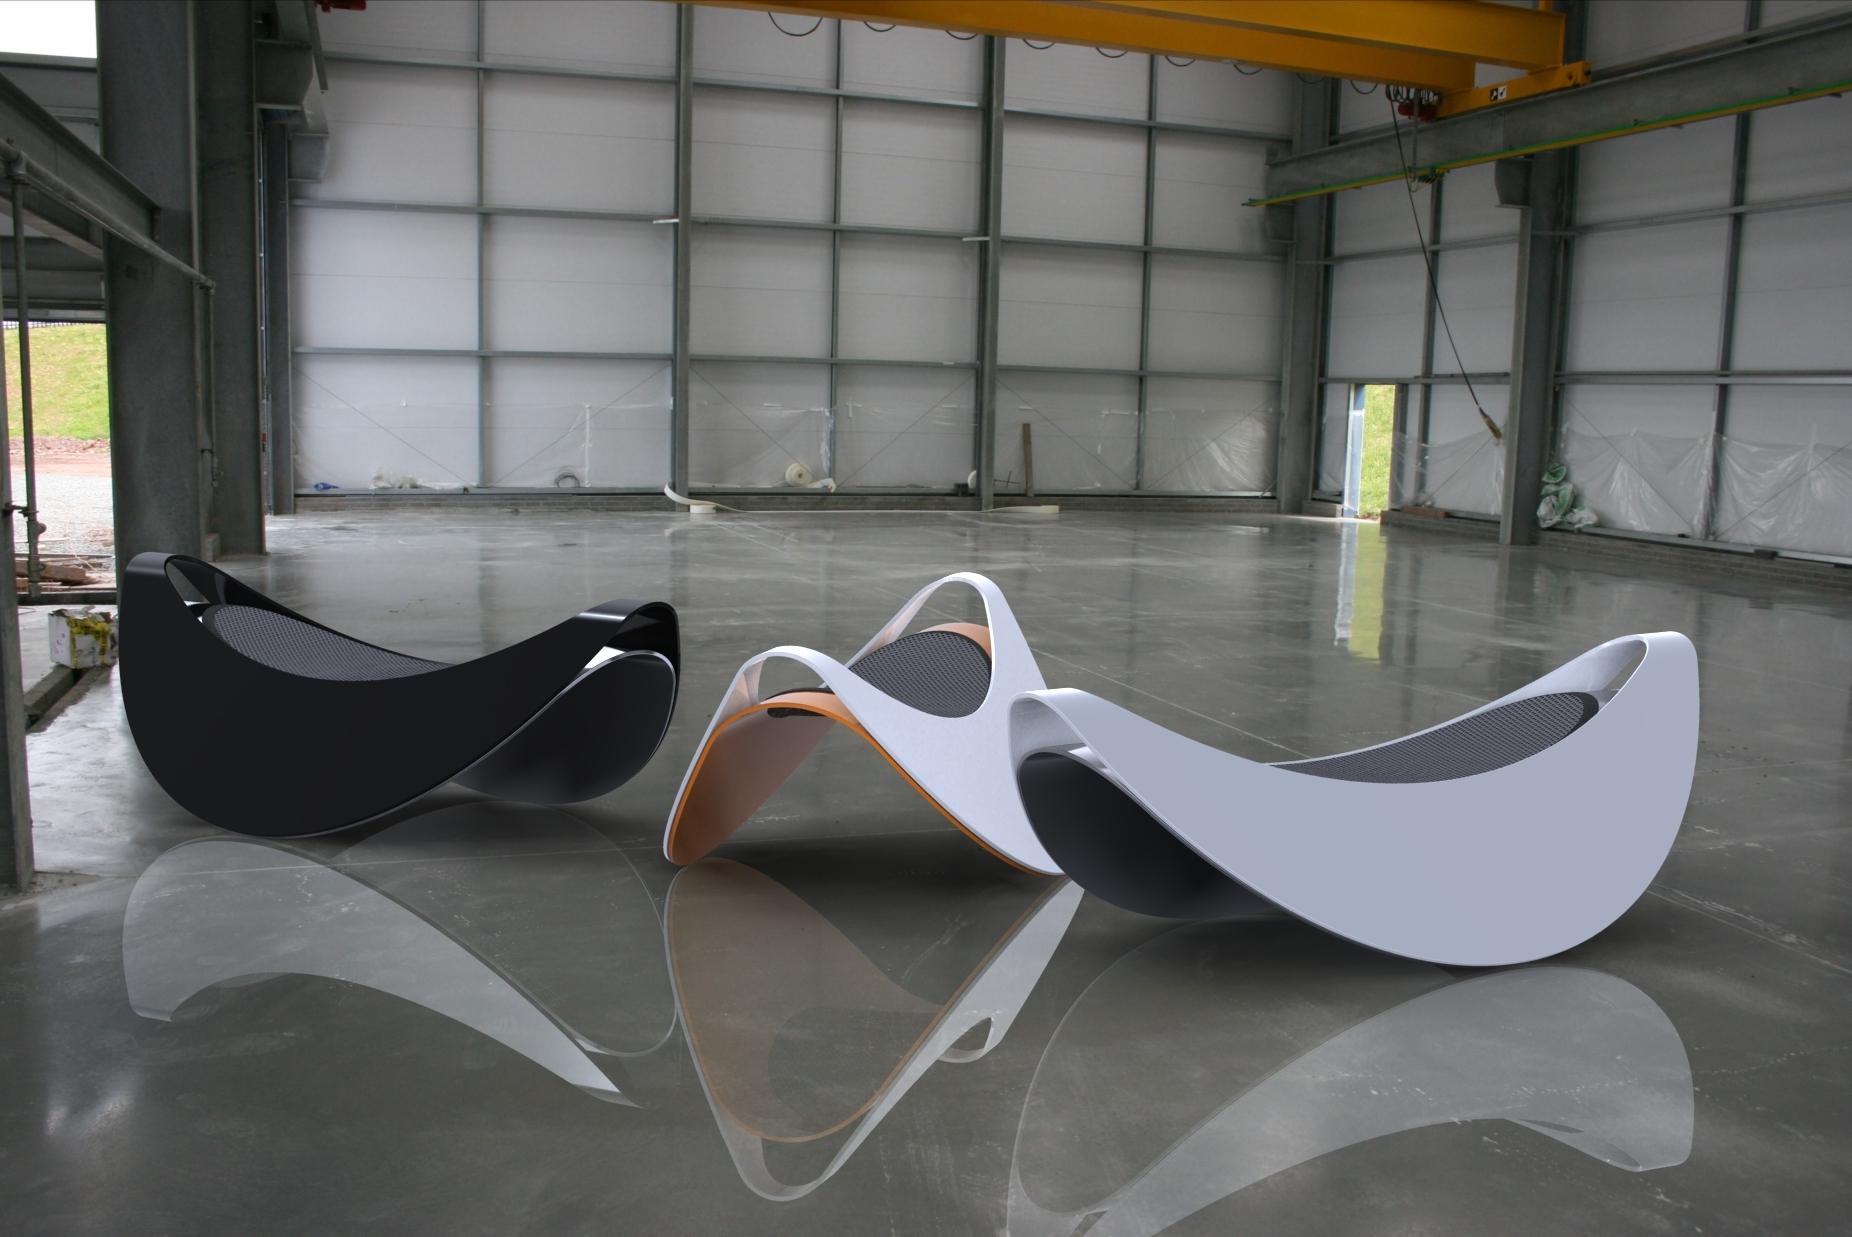 Rocking Chair + Hammock Concept